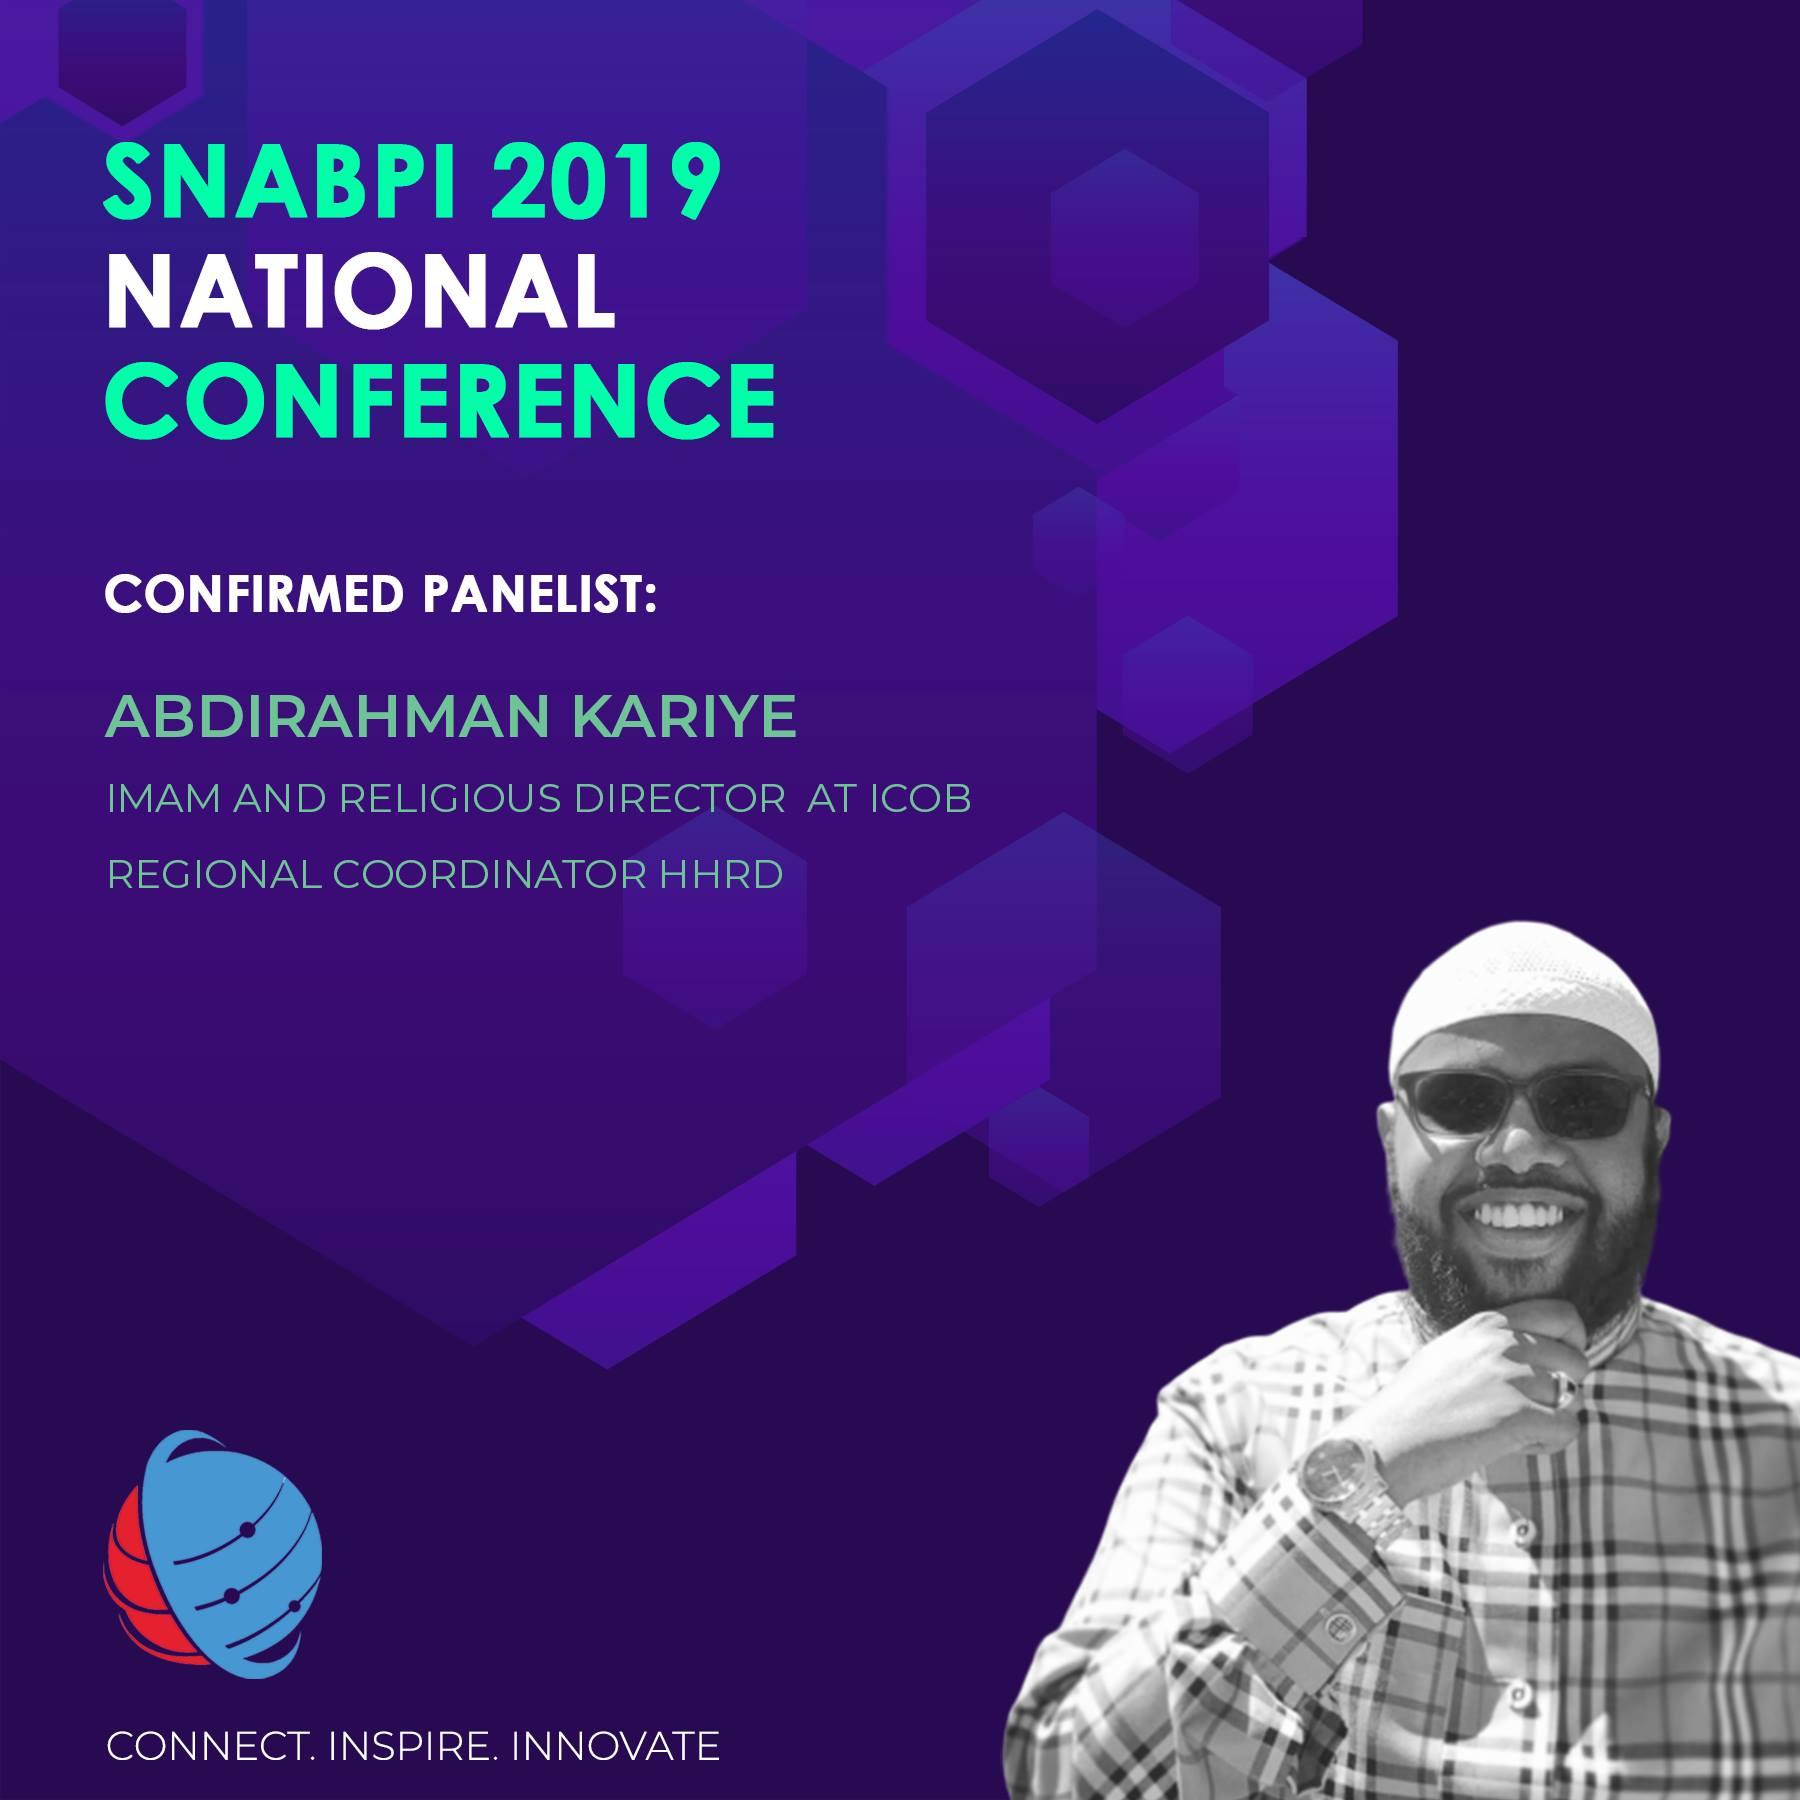 Speaker biography courtesy of SNABPI and thumbnail photo credit : Abdullahi Hassan for SNABPI